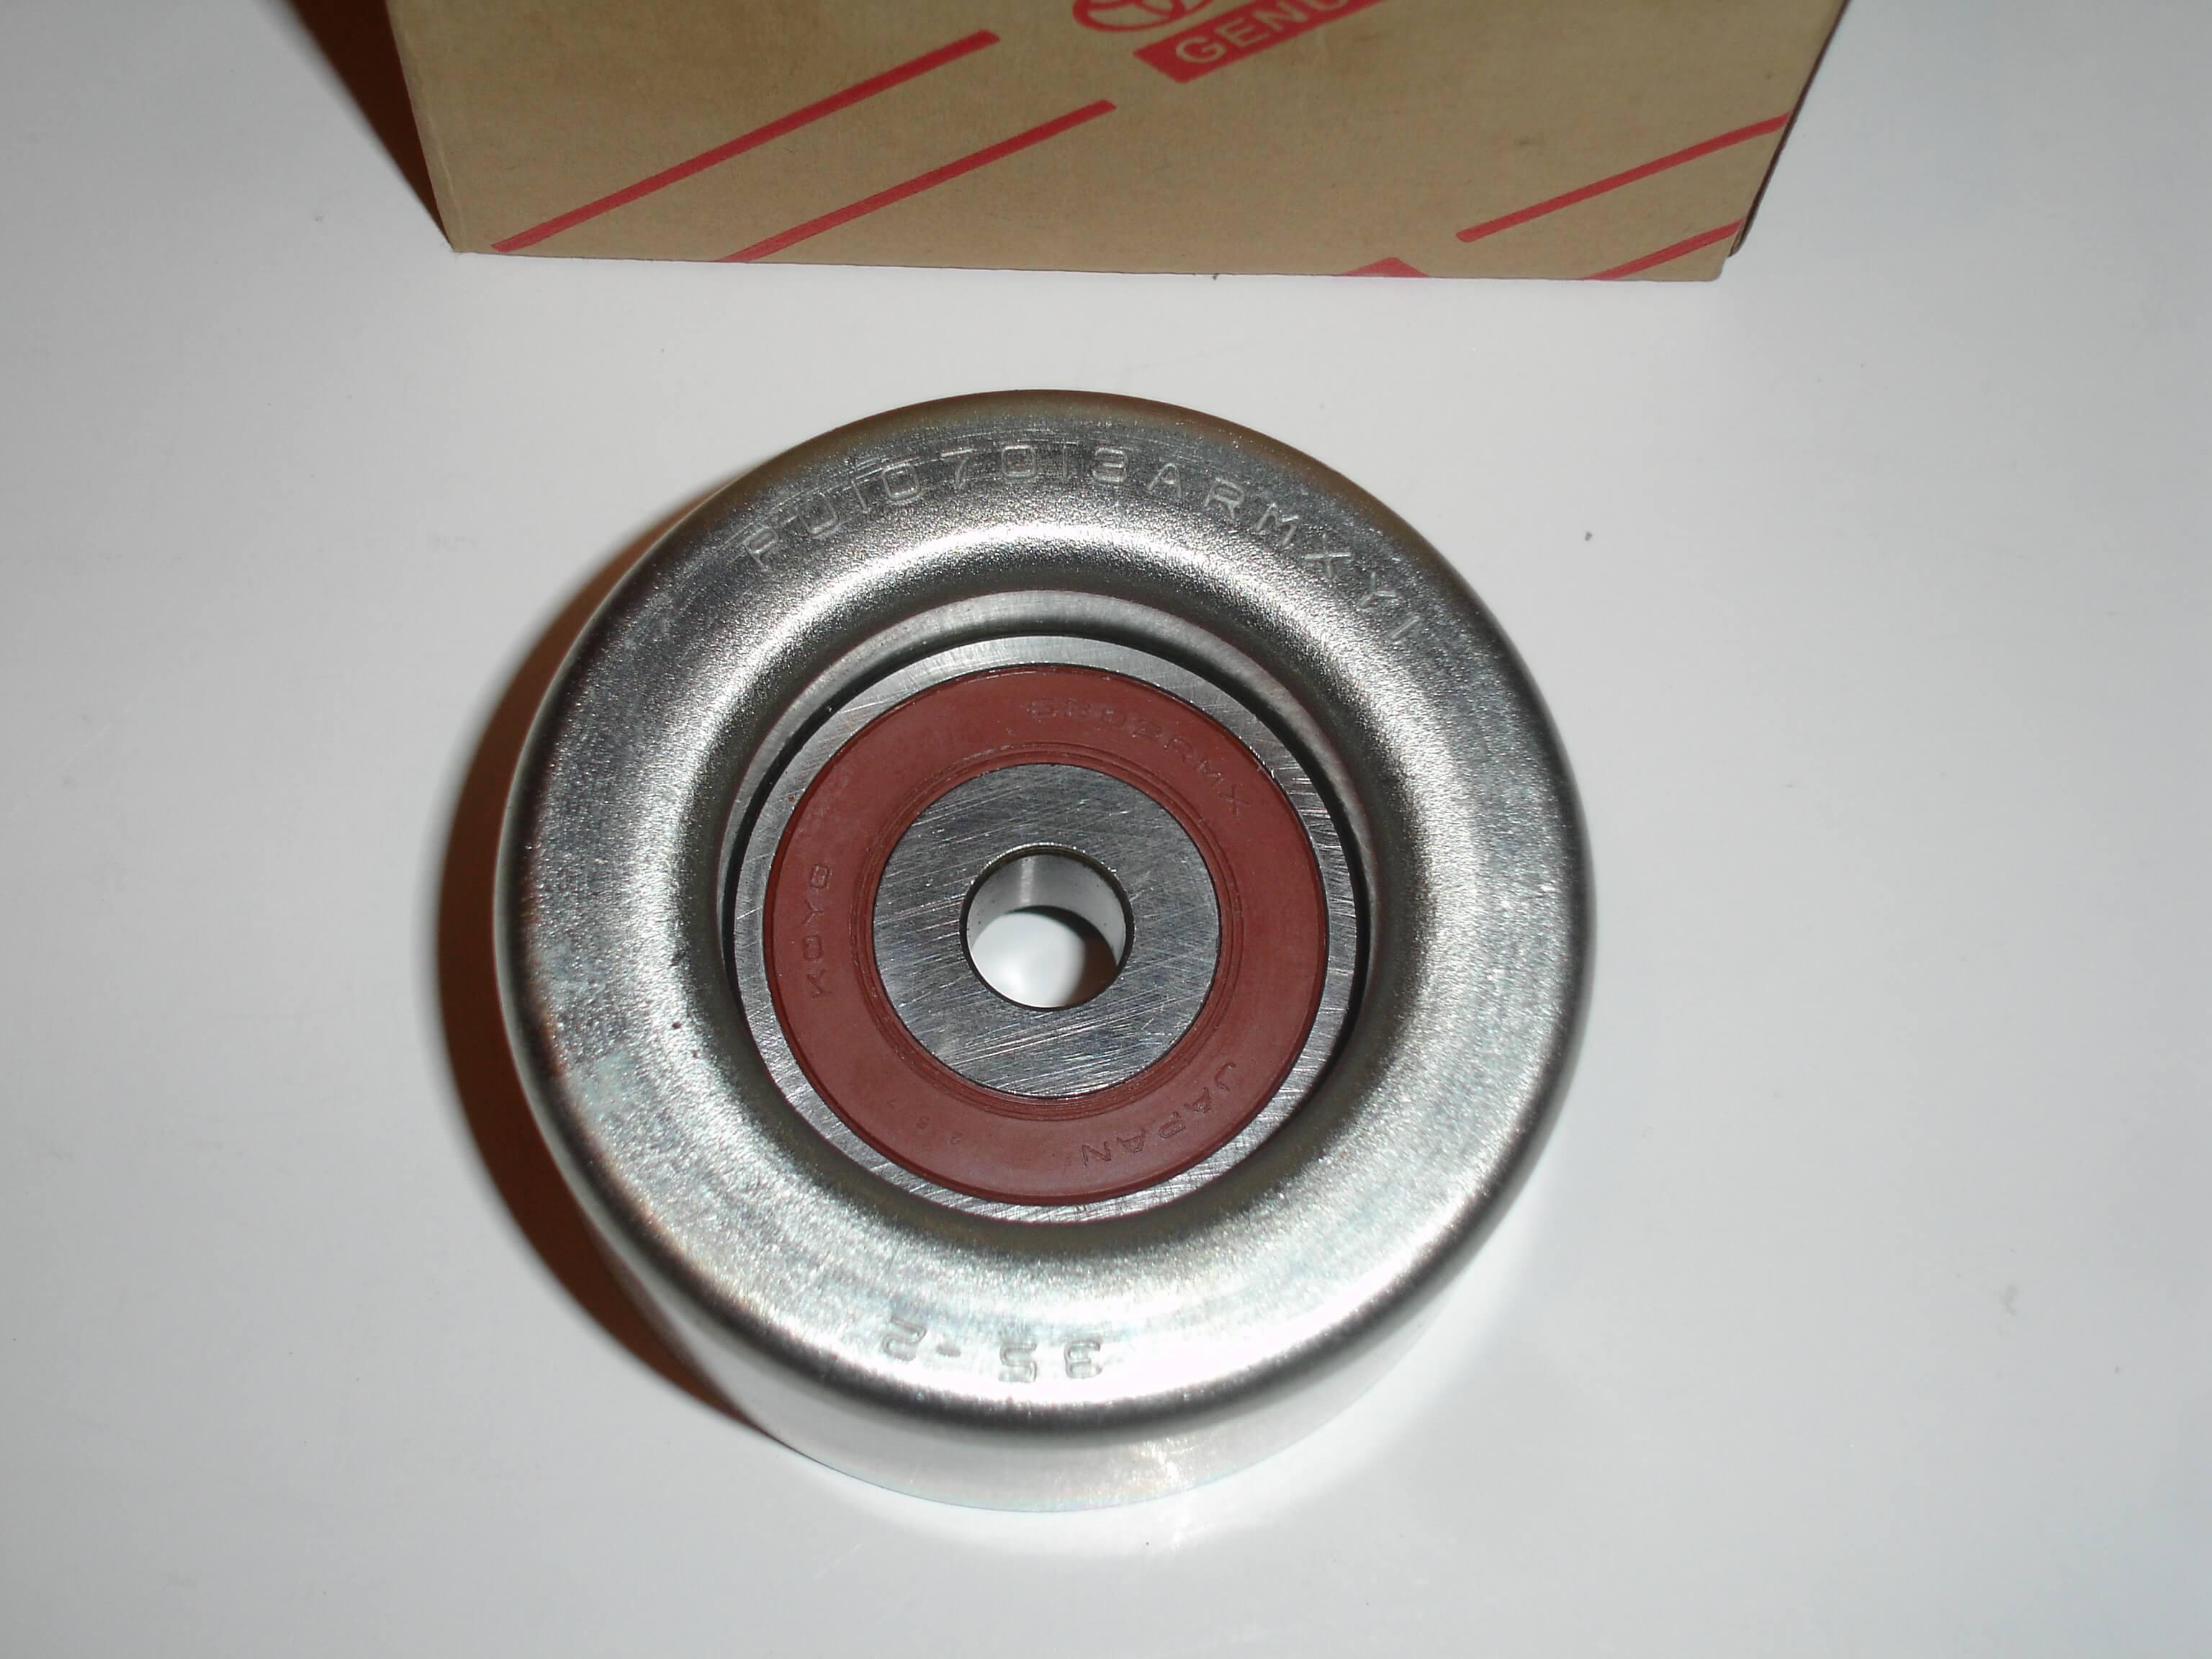 Toyota Lexus OEM 16604-31010 Idler Pulley No. 2 16604-31020 16604-0P011 Tacoma